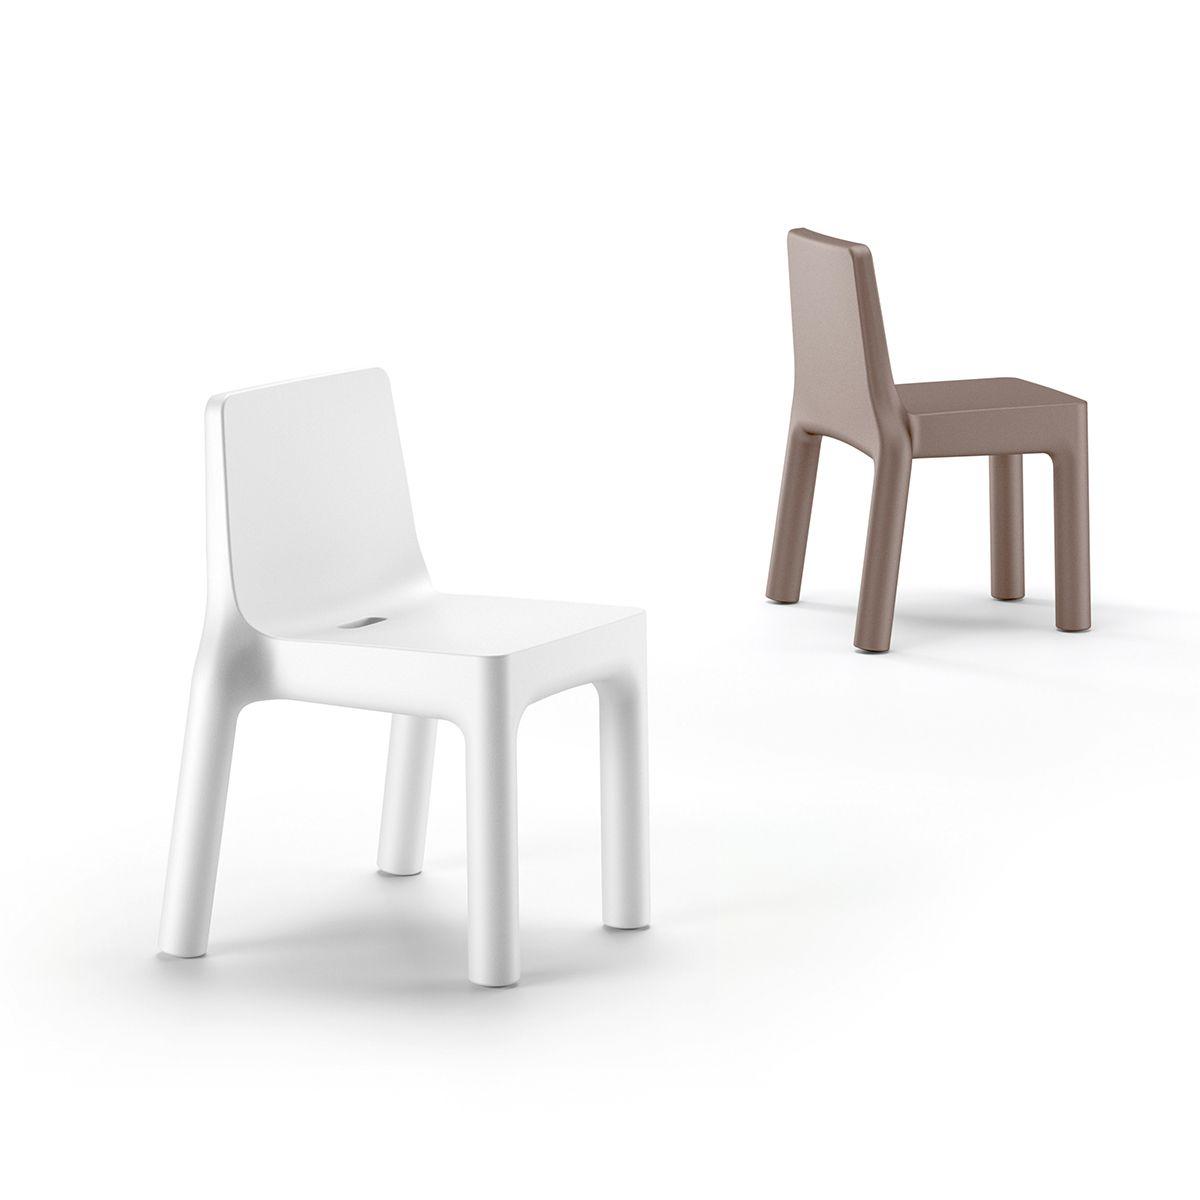 Sedia Simple Euro3plast Gruppo Inventa Arredamento